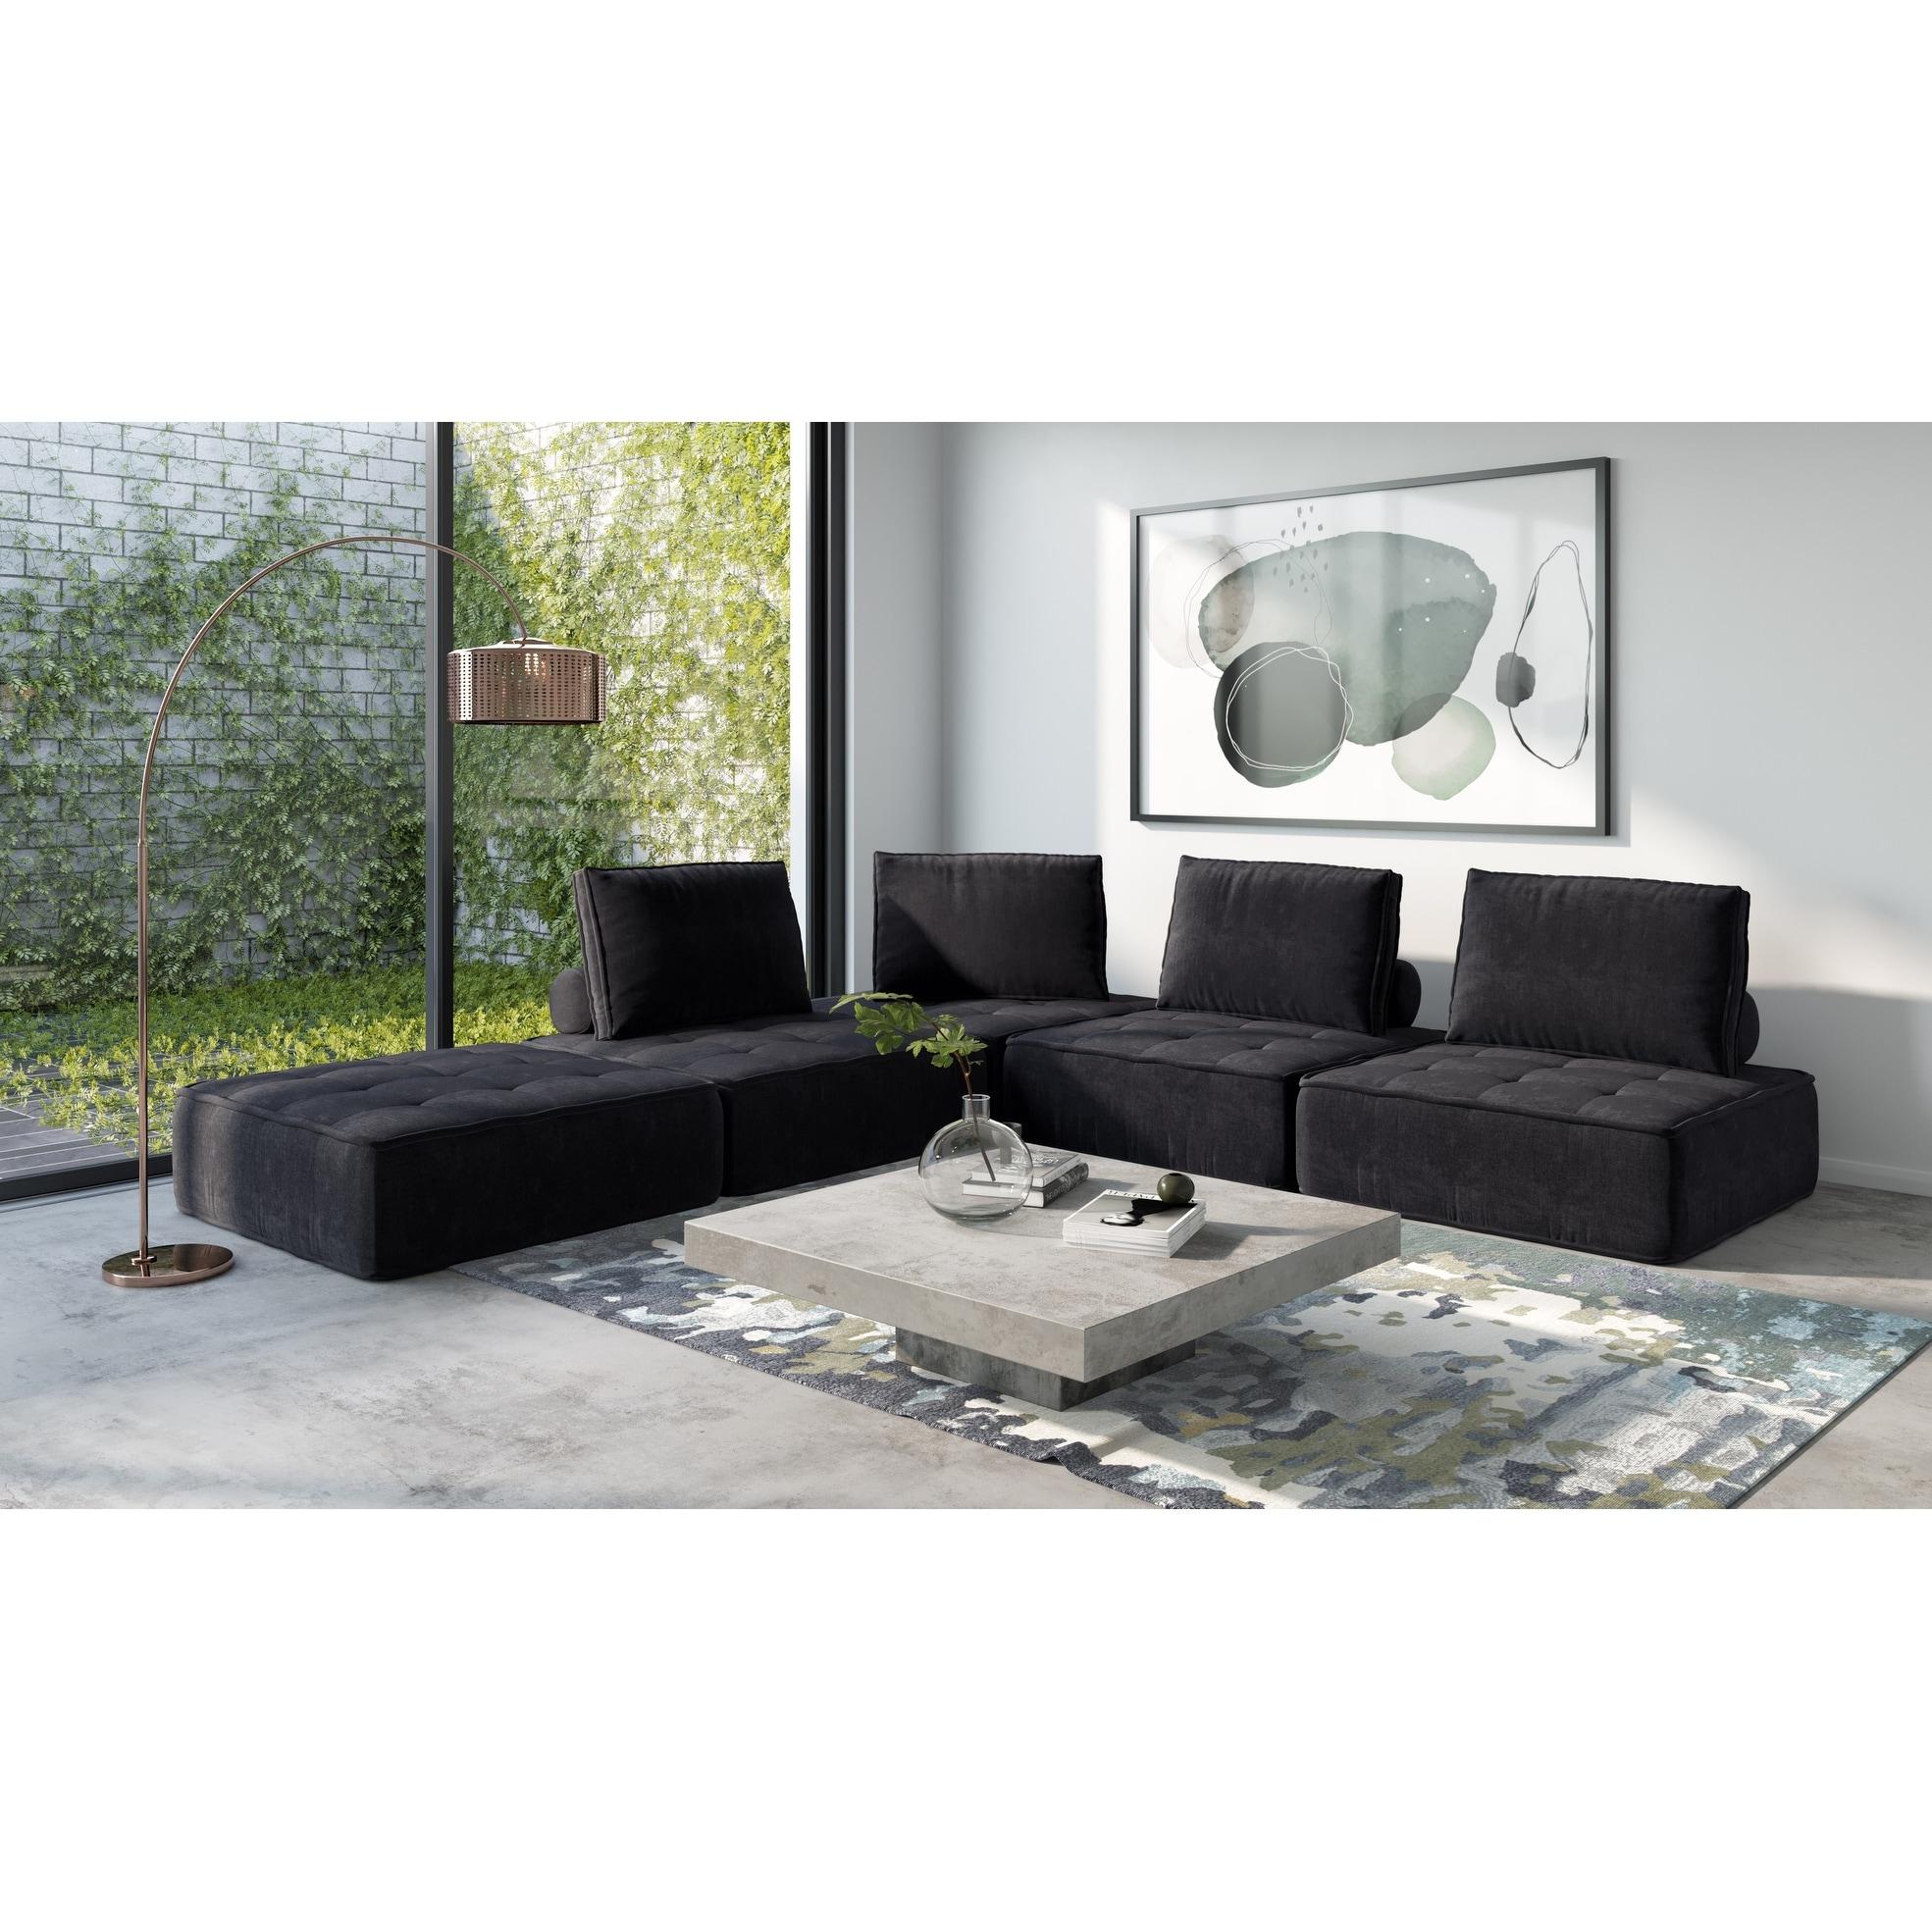 Divani Casa Nolden Modern Black Fabric Sectional Sofa On Sale Overstock 30609099